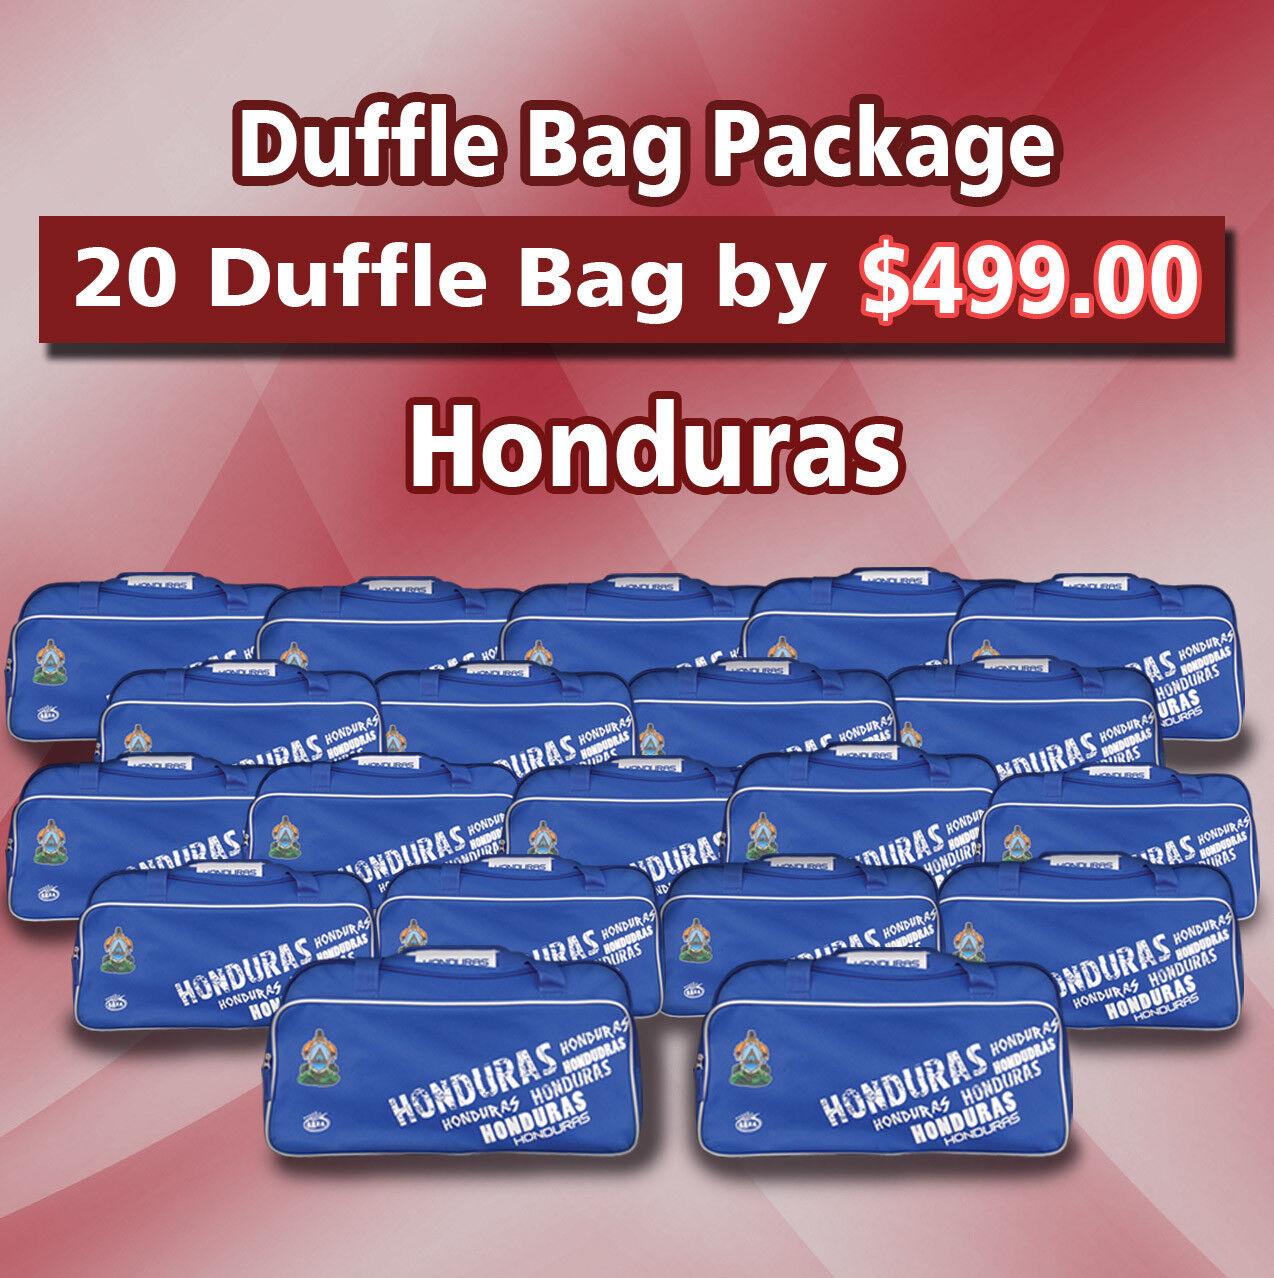 20 Bolsa De Lona Paquete Honduras Color azul por Arza fútbol (equipo Bolsa)